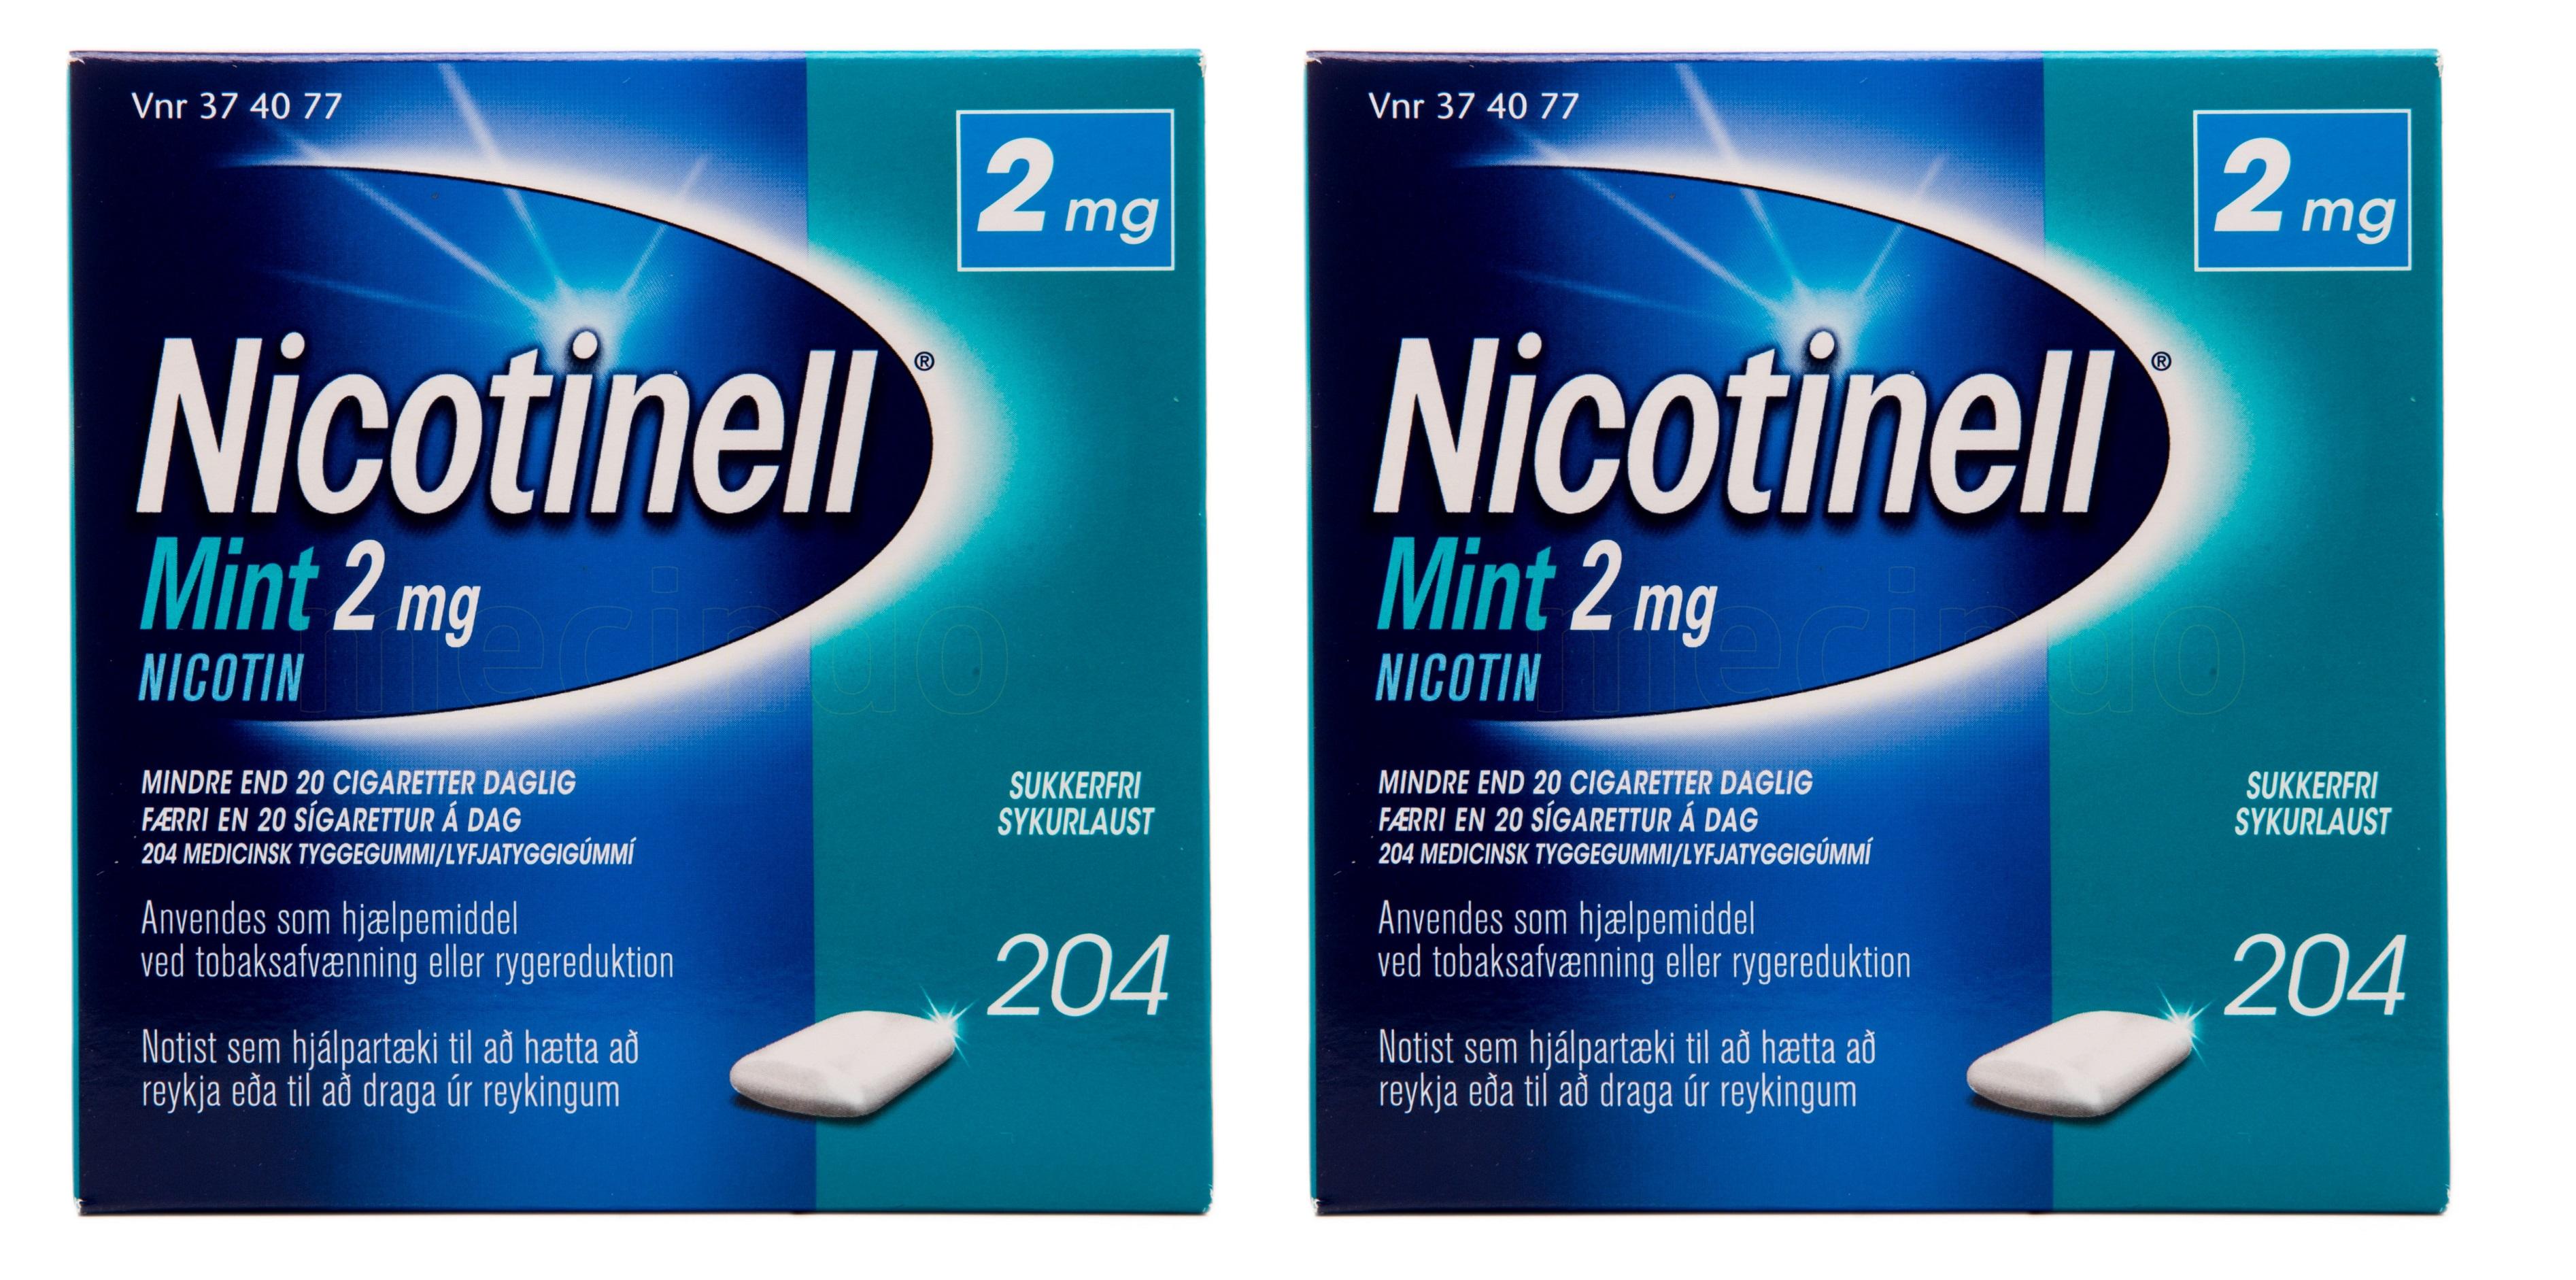 Billede af Nicotinell Tyggegummi Mint - 2 mg - 408 stk